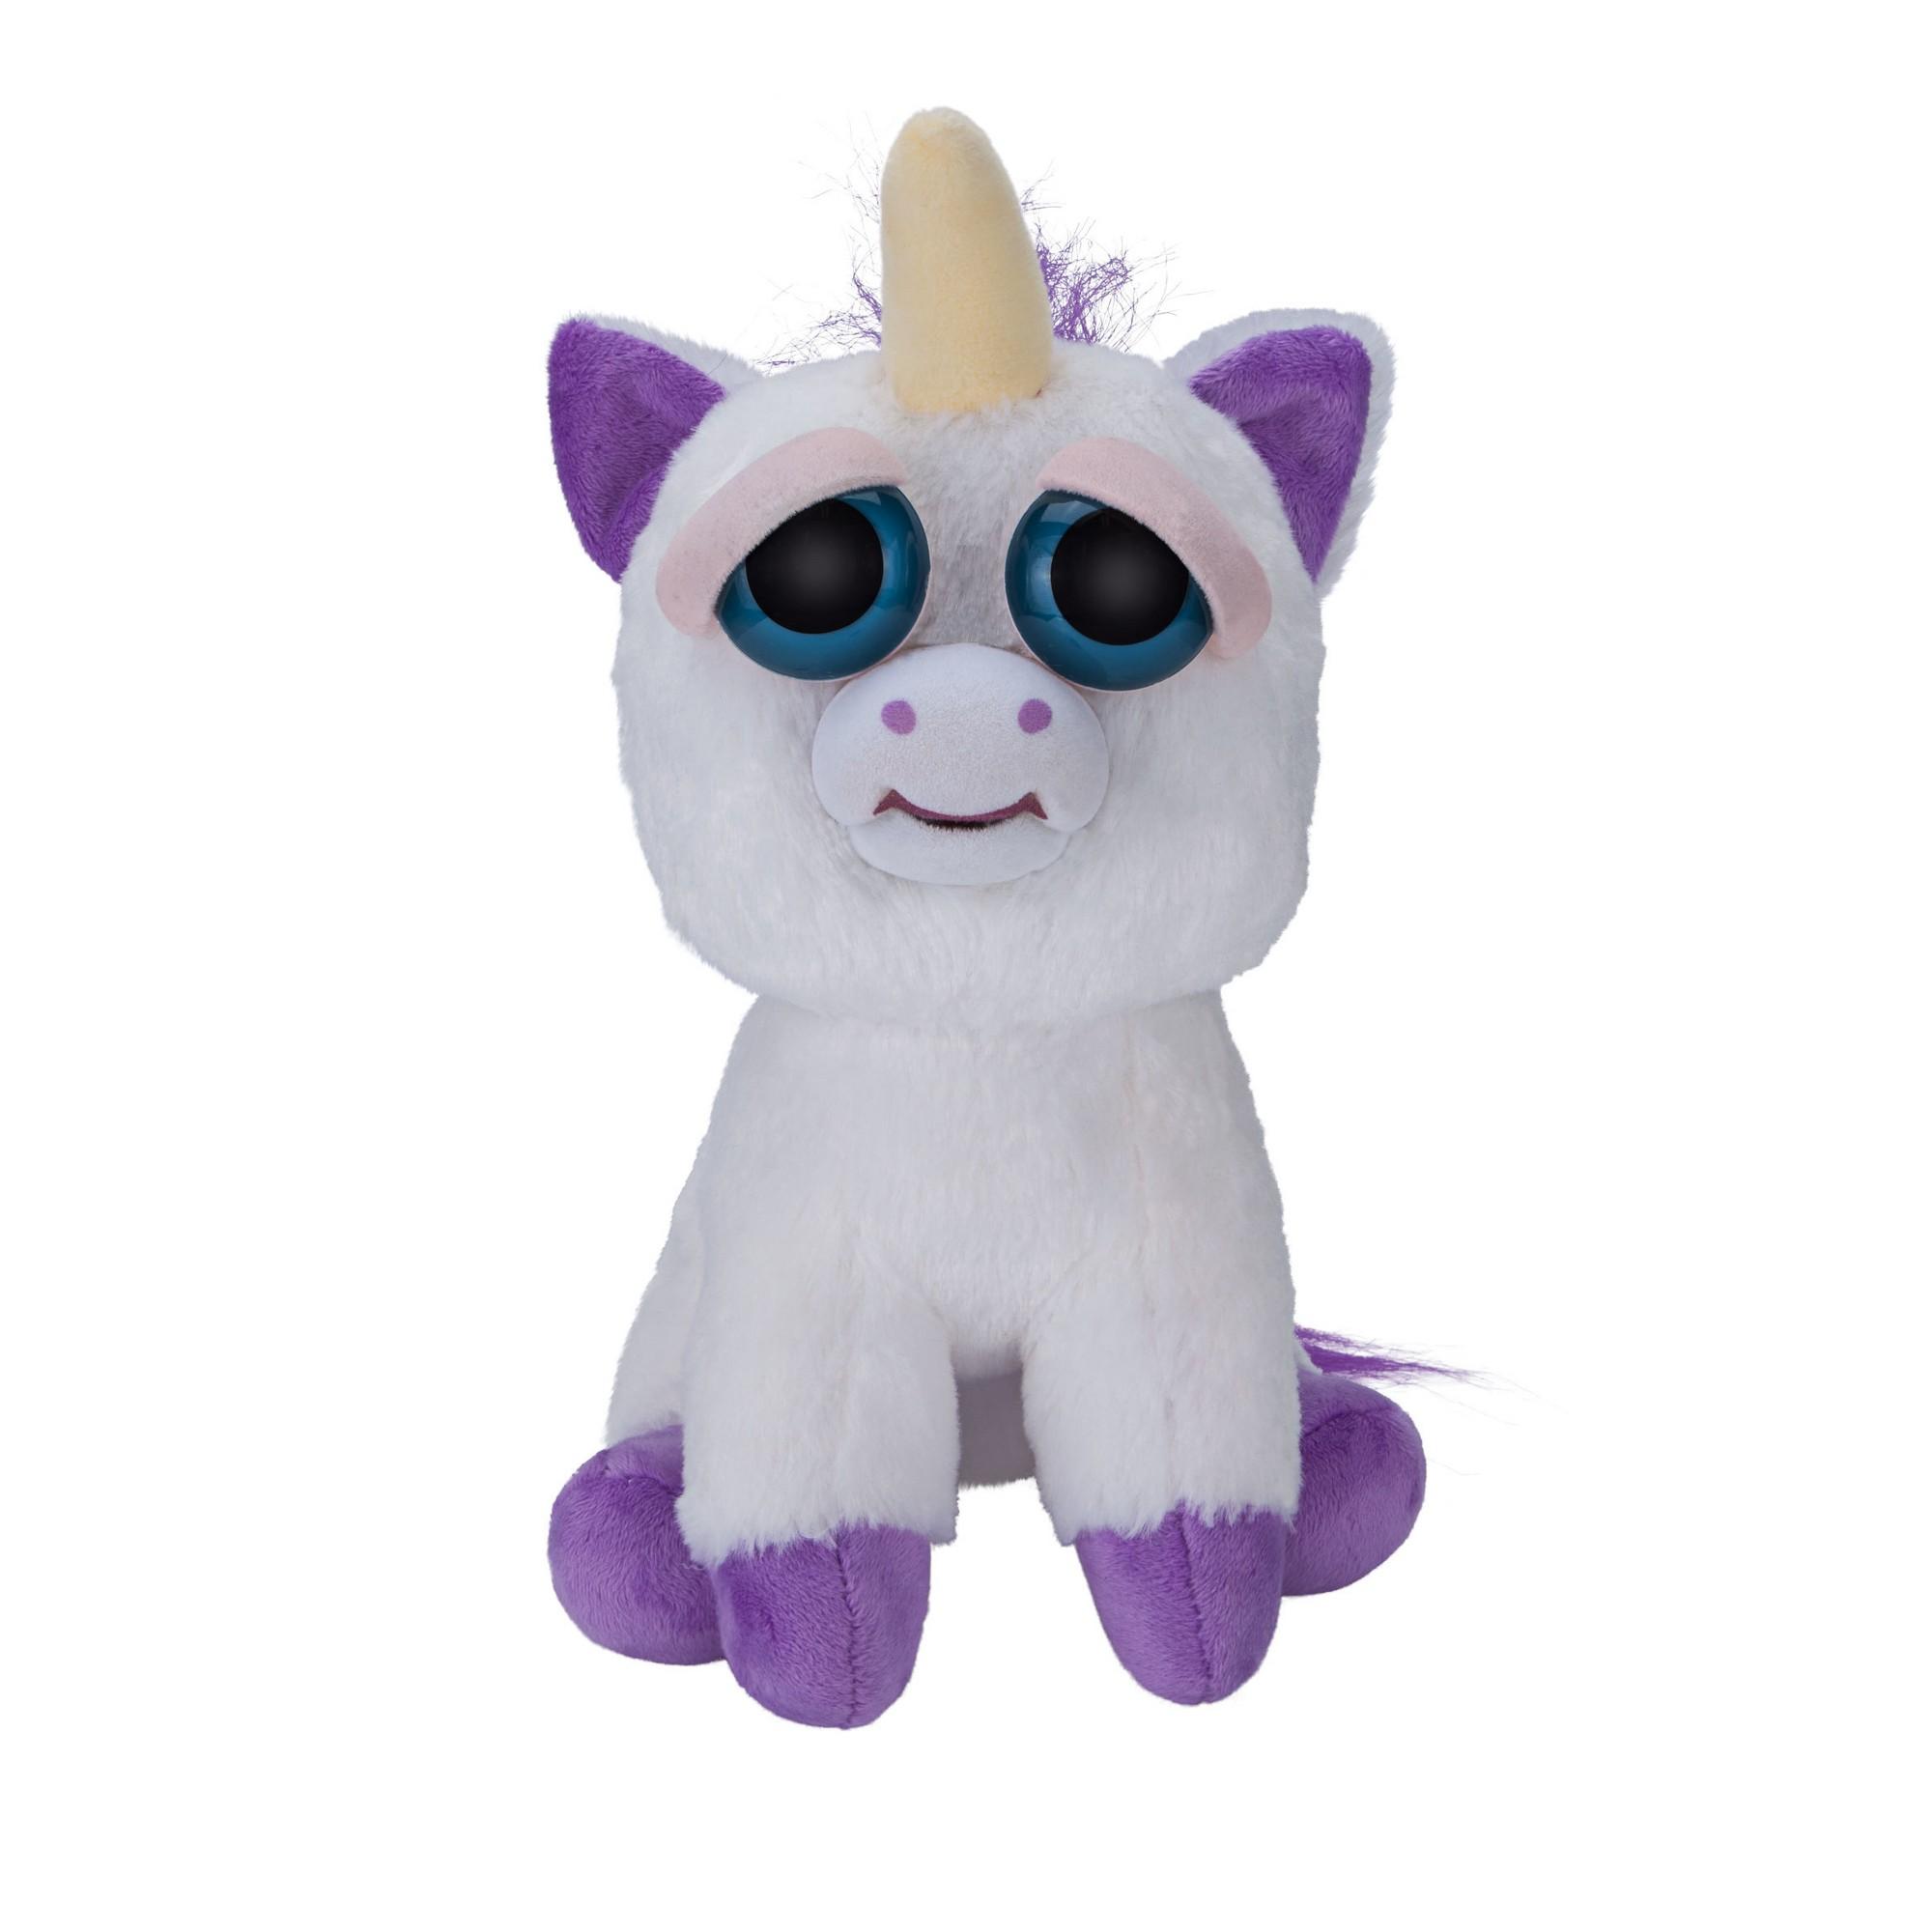 Feisty Pets Unicorn Plush Glenda Glitterpoop in 2019